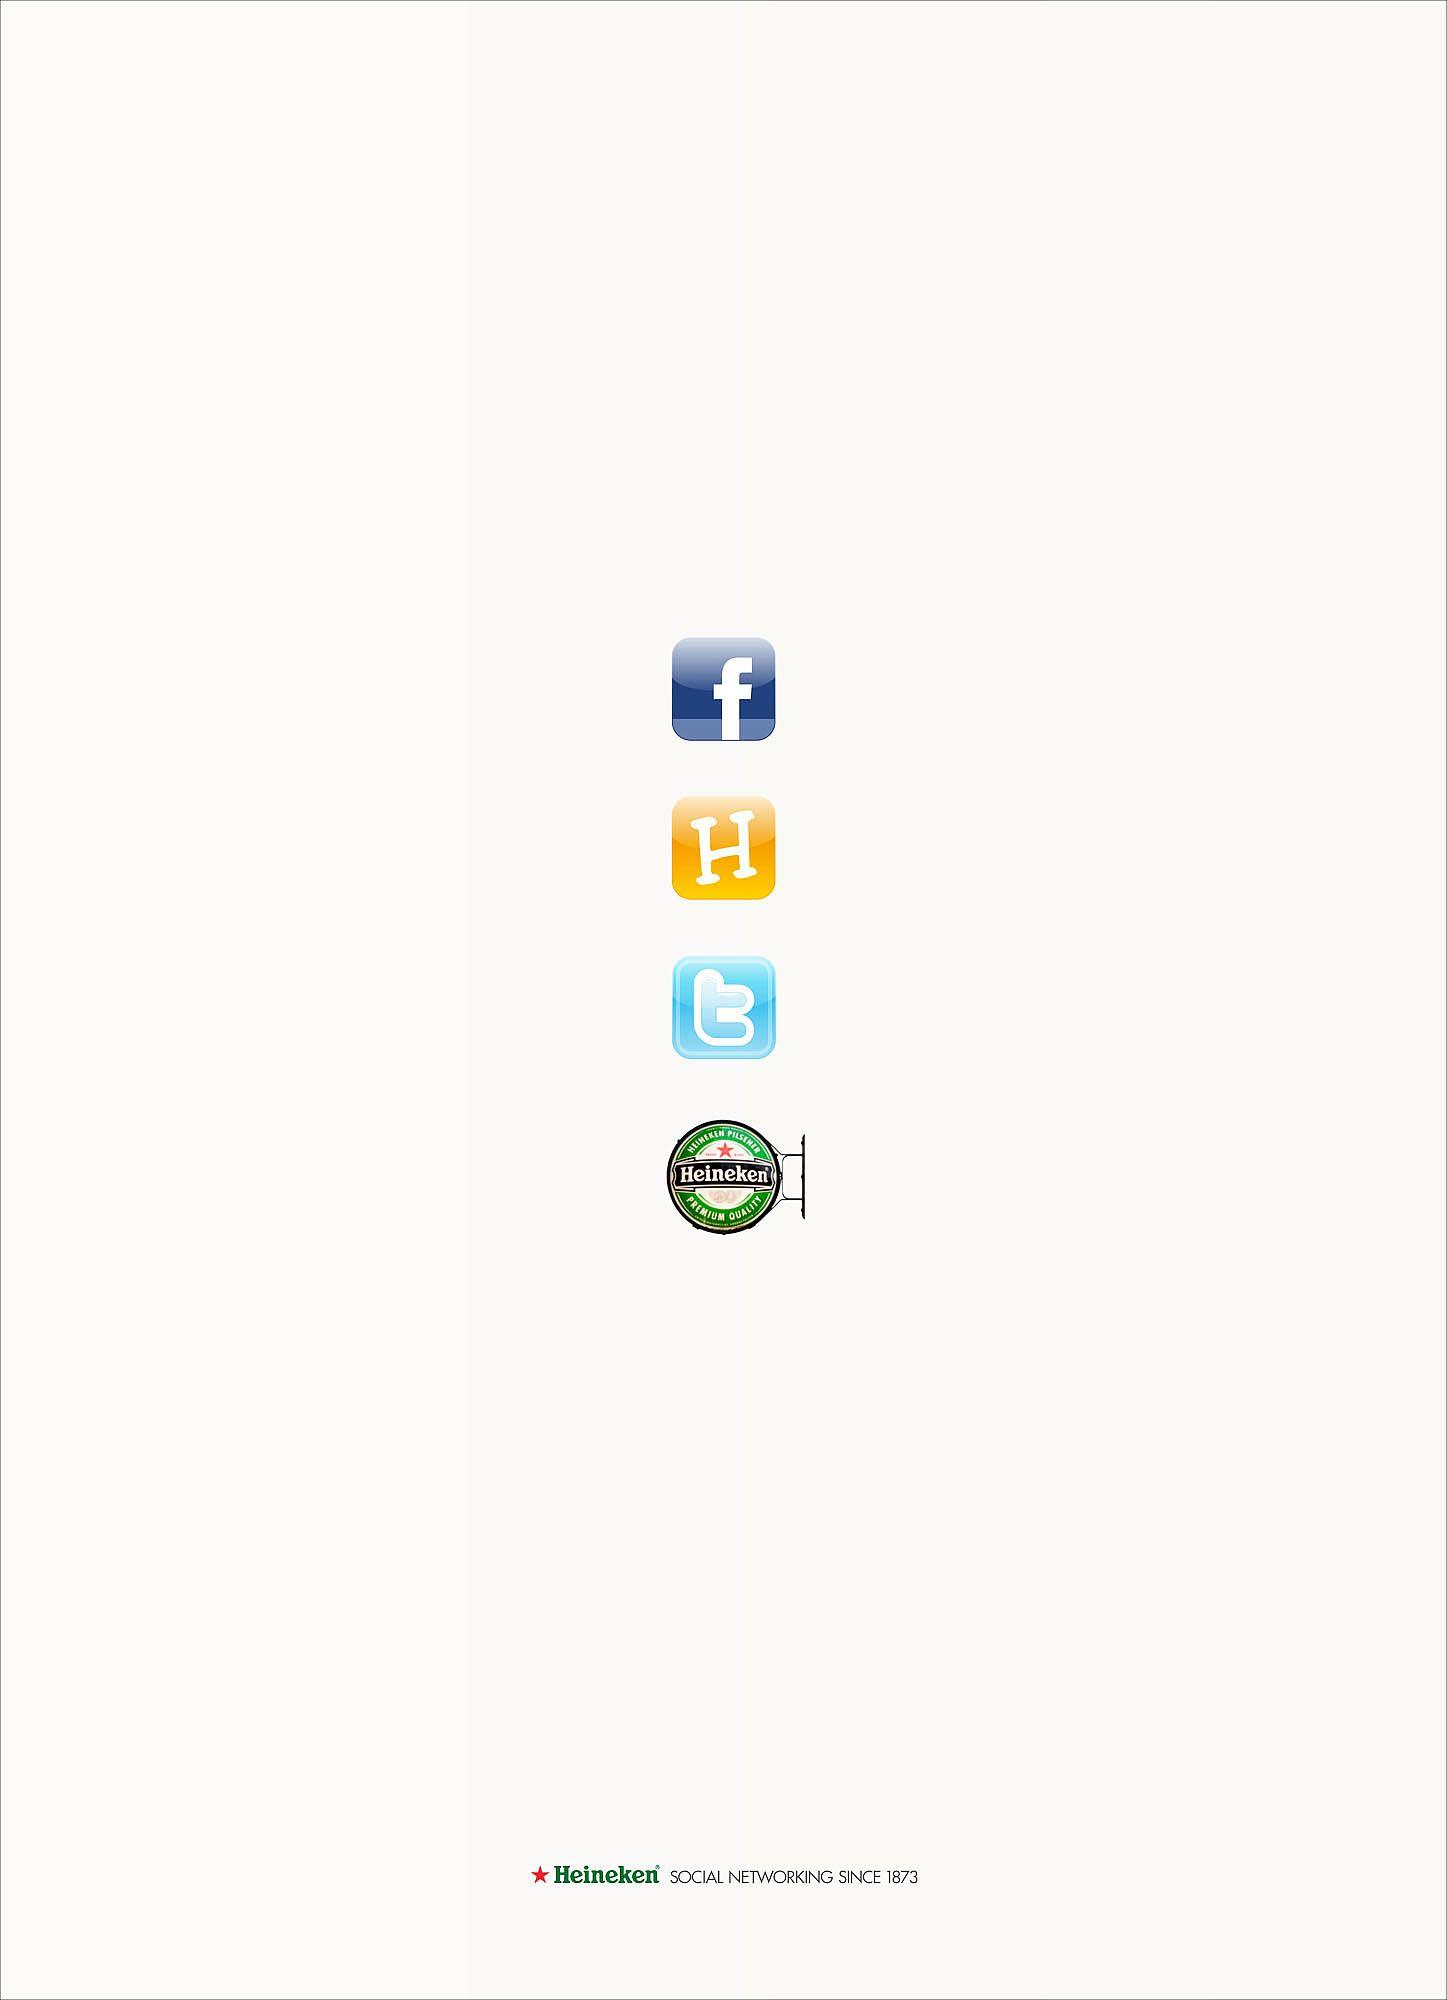 Social Networking Since Heineken